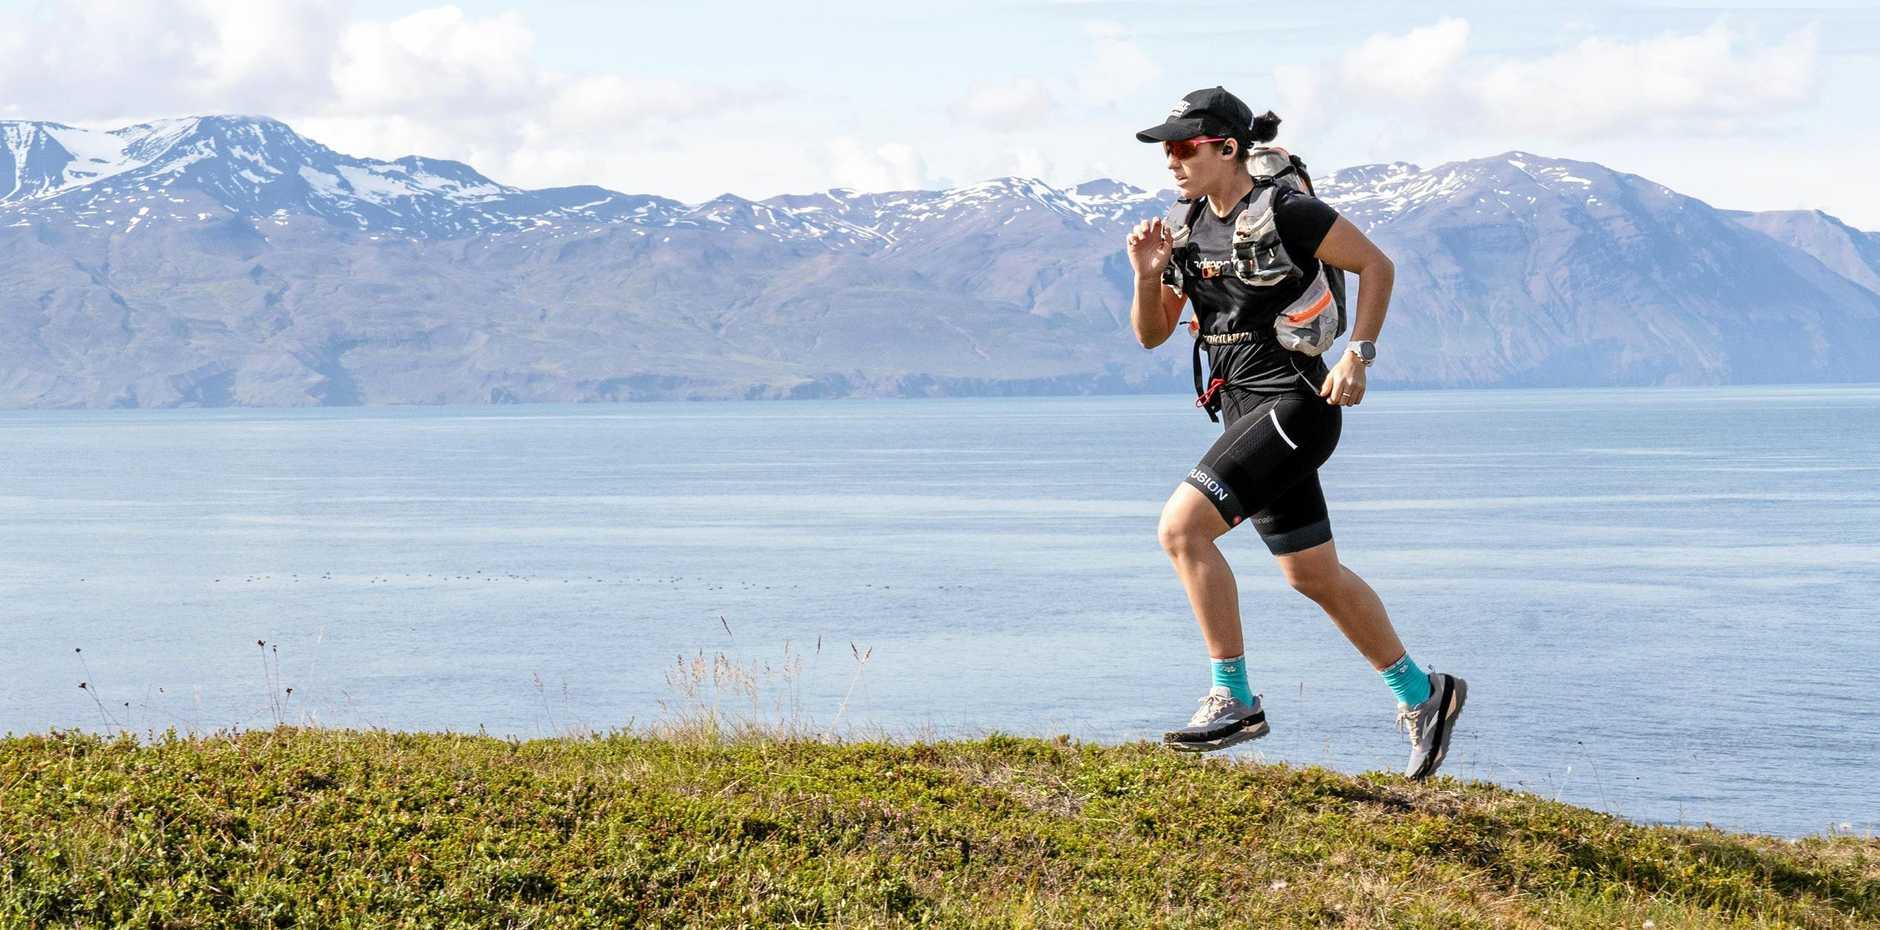 Ultra marathon runner Jacqui Bell during her journey in Iceland.